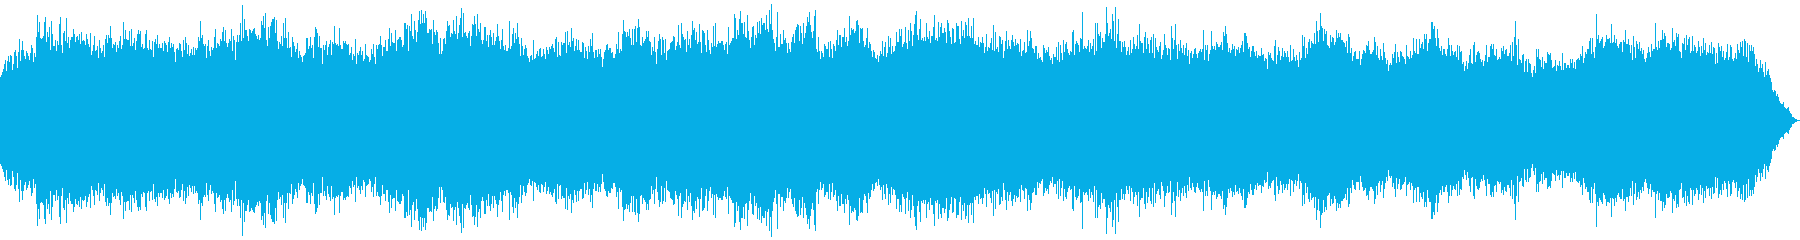 PADS 落下01の再生済みの波形